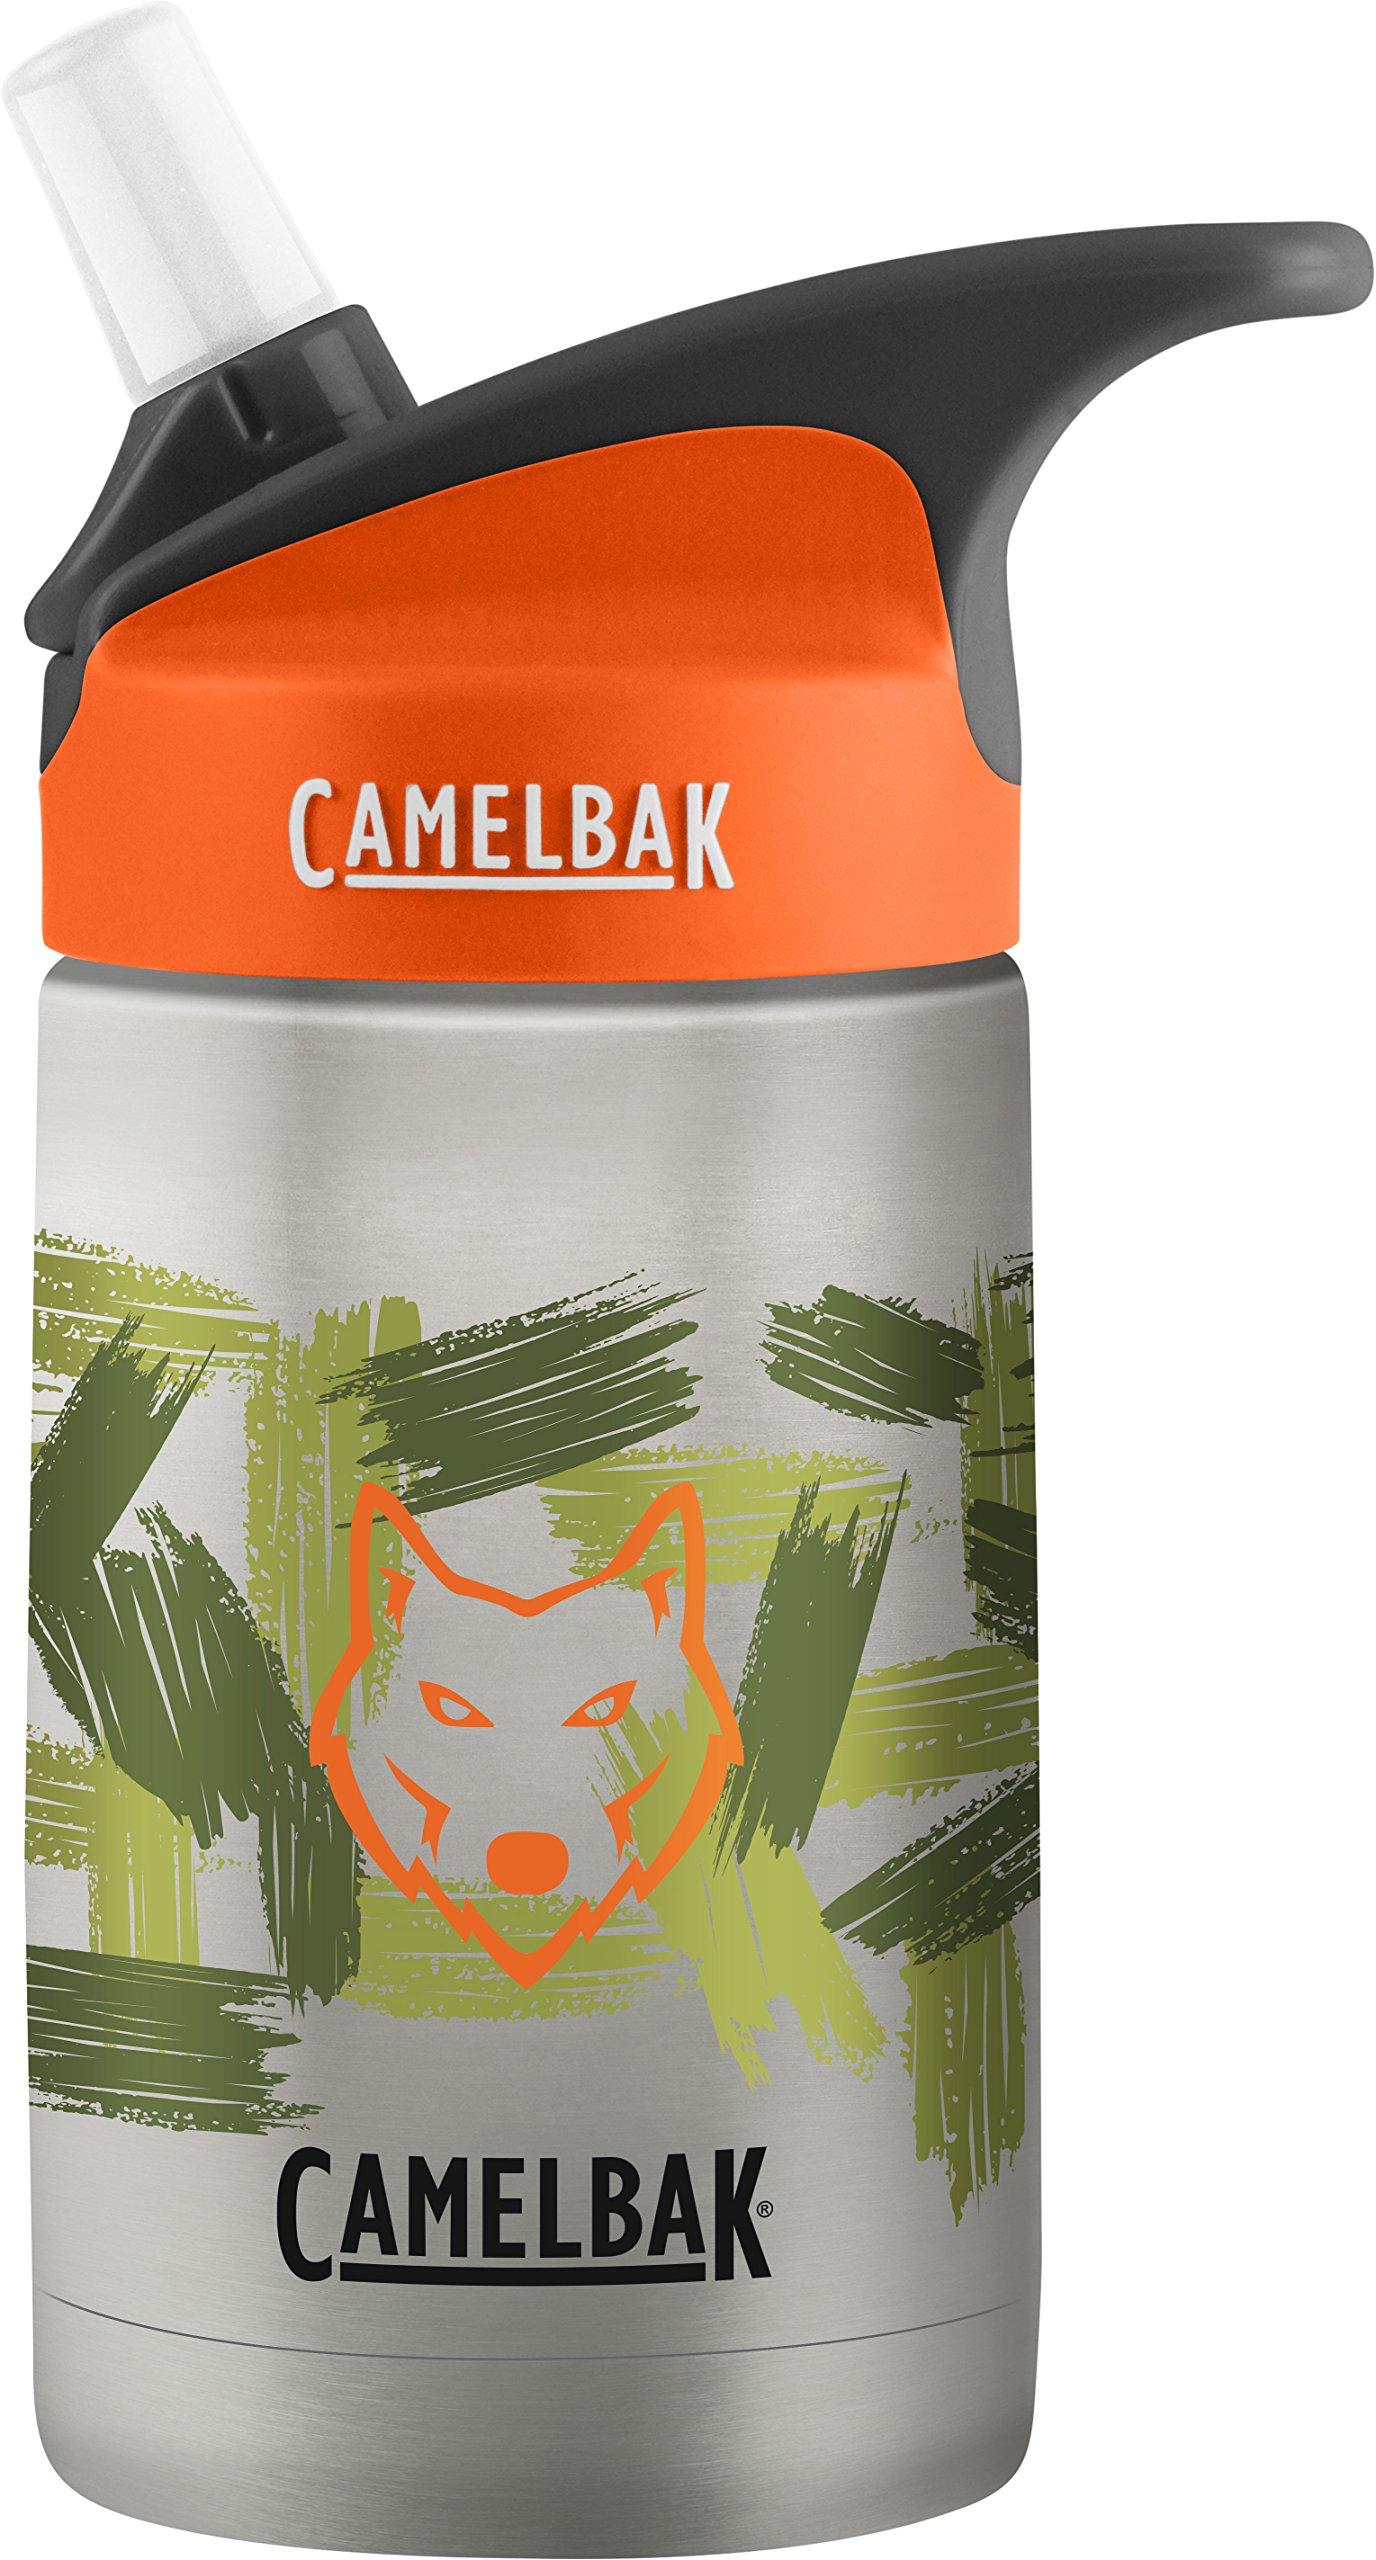 CamelBak Eddy Kids Vacuum Stainless Waterbottle, Wolf Camo, 12 oz